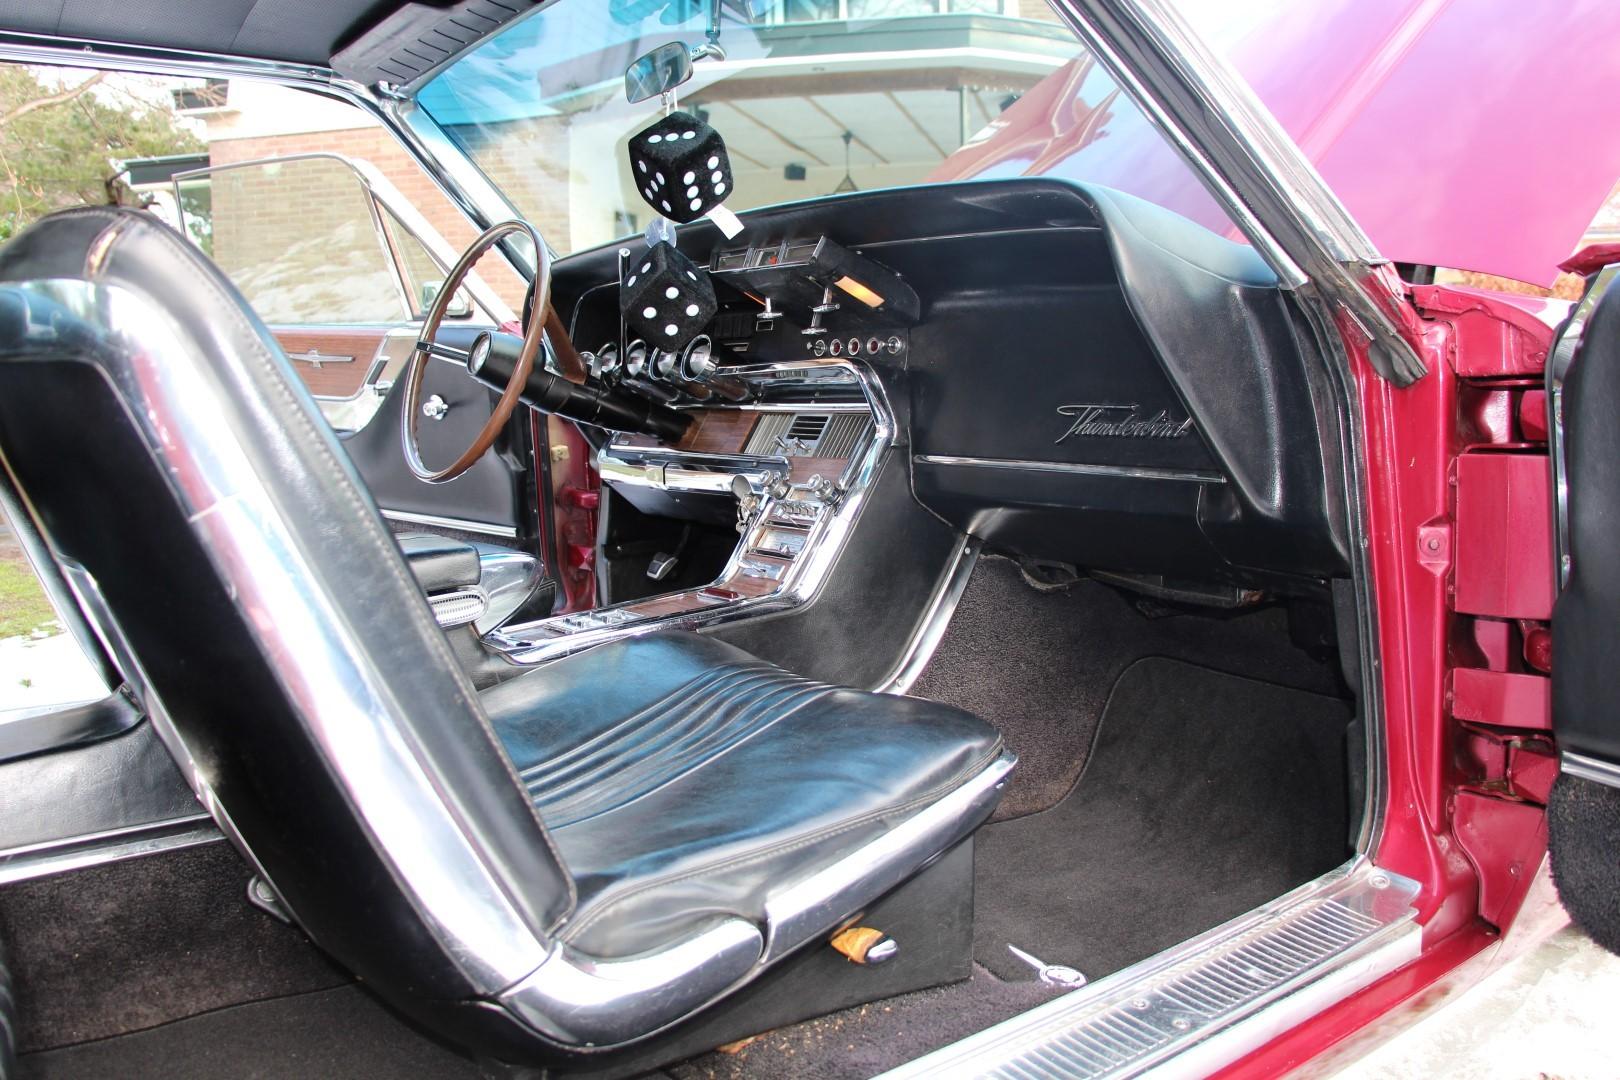 1965 Ford Thunderbird Hardtop - Burgundy new (6)